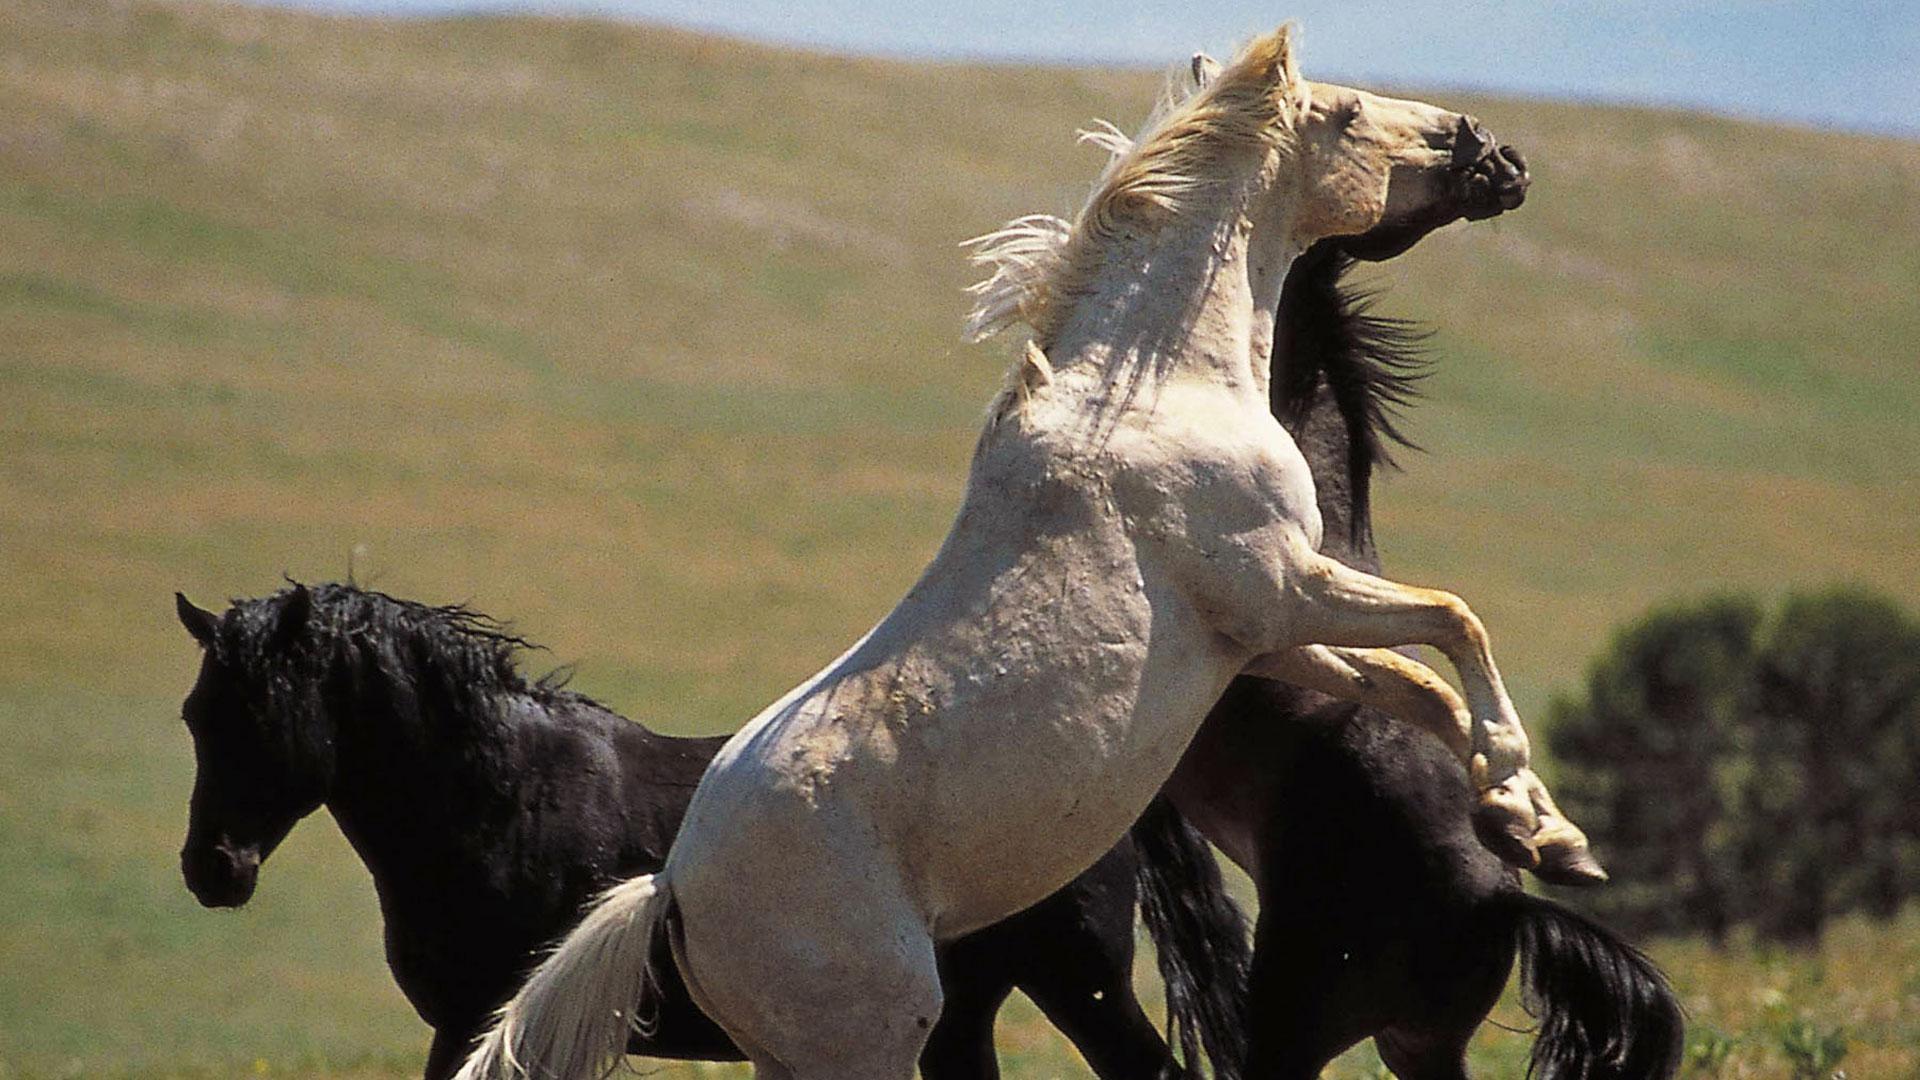 West indies black stallion shows off pakistani girl conquest - 3 1